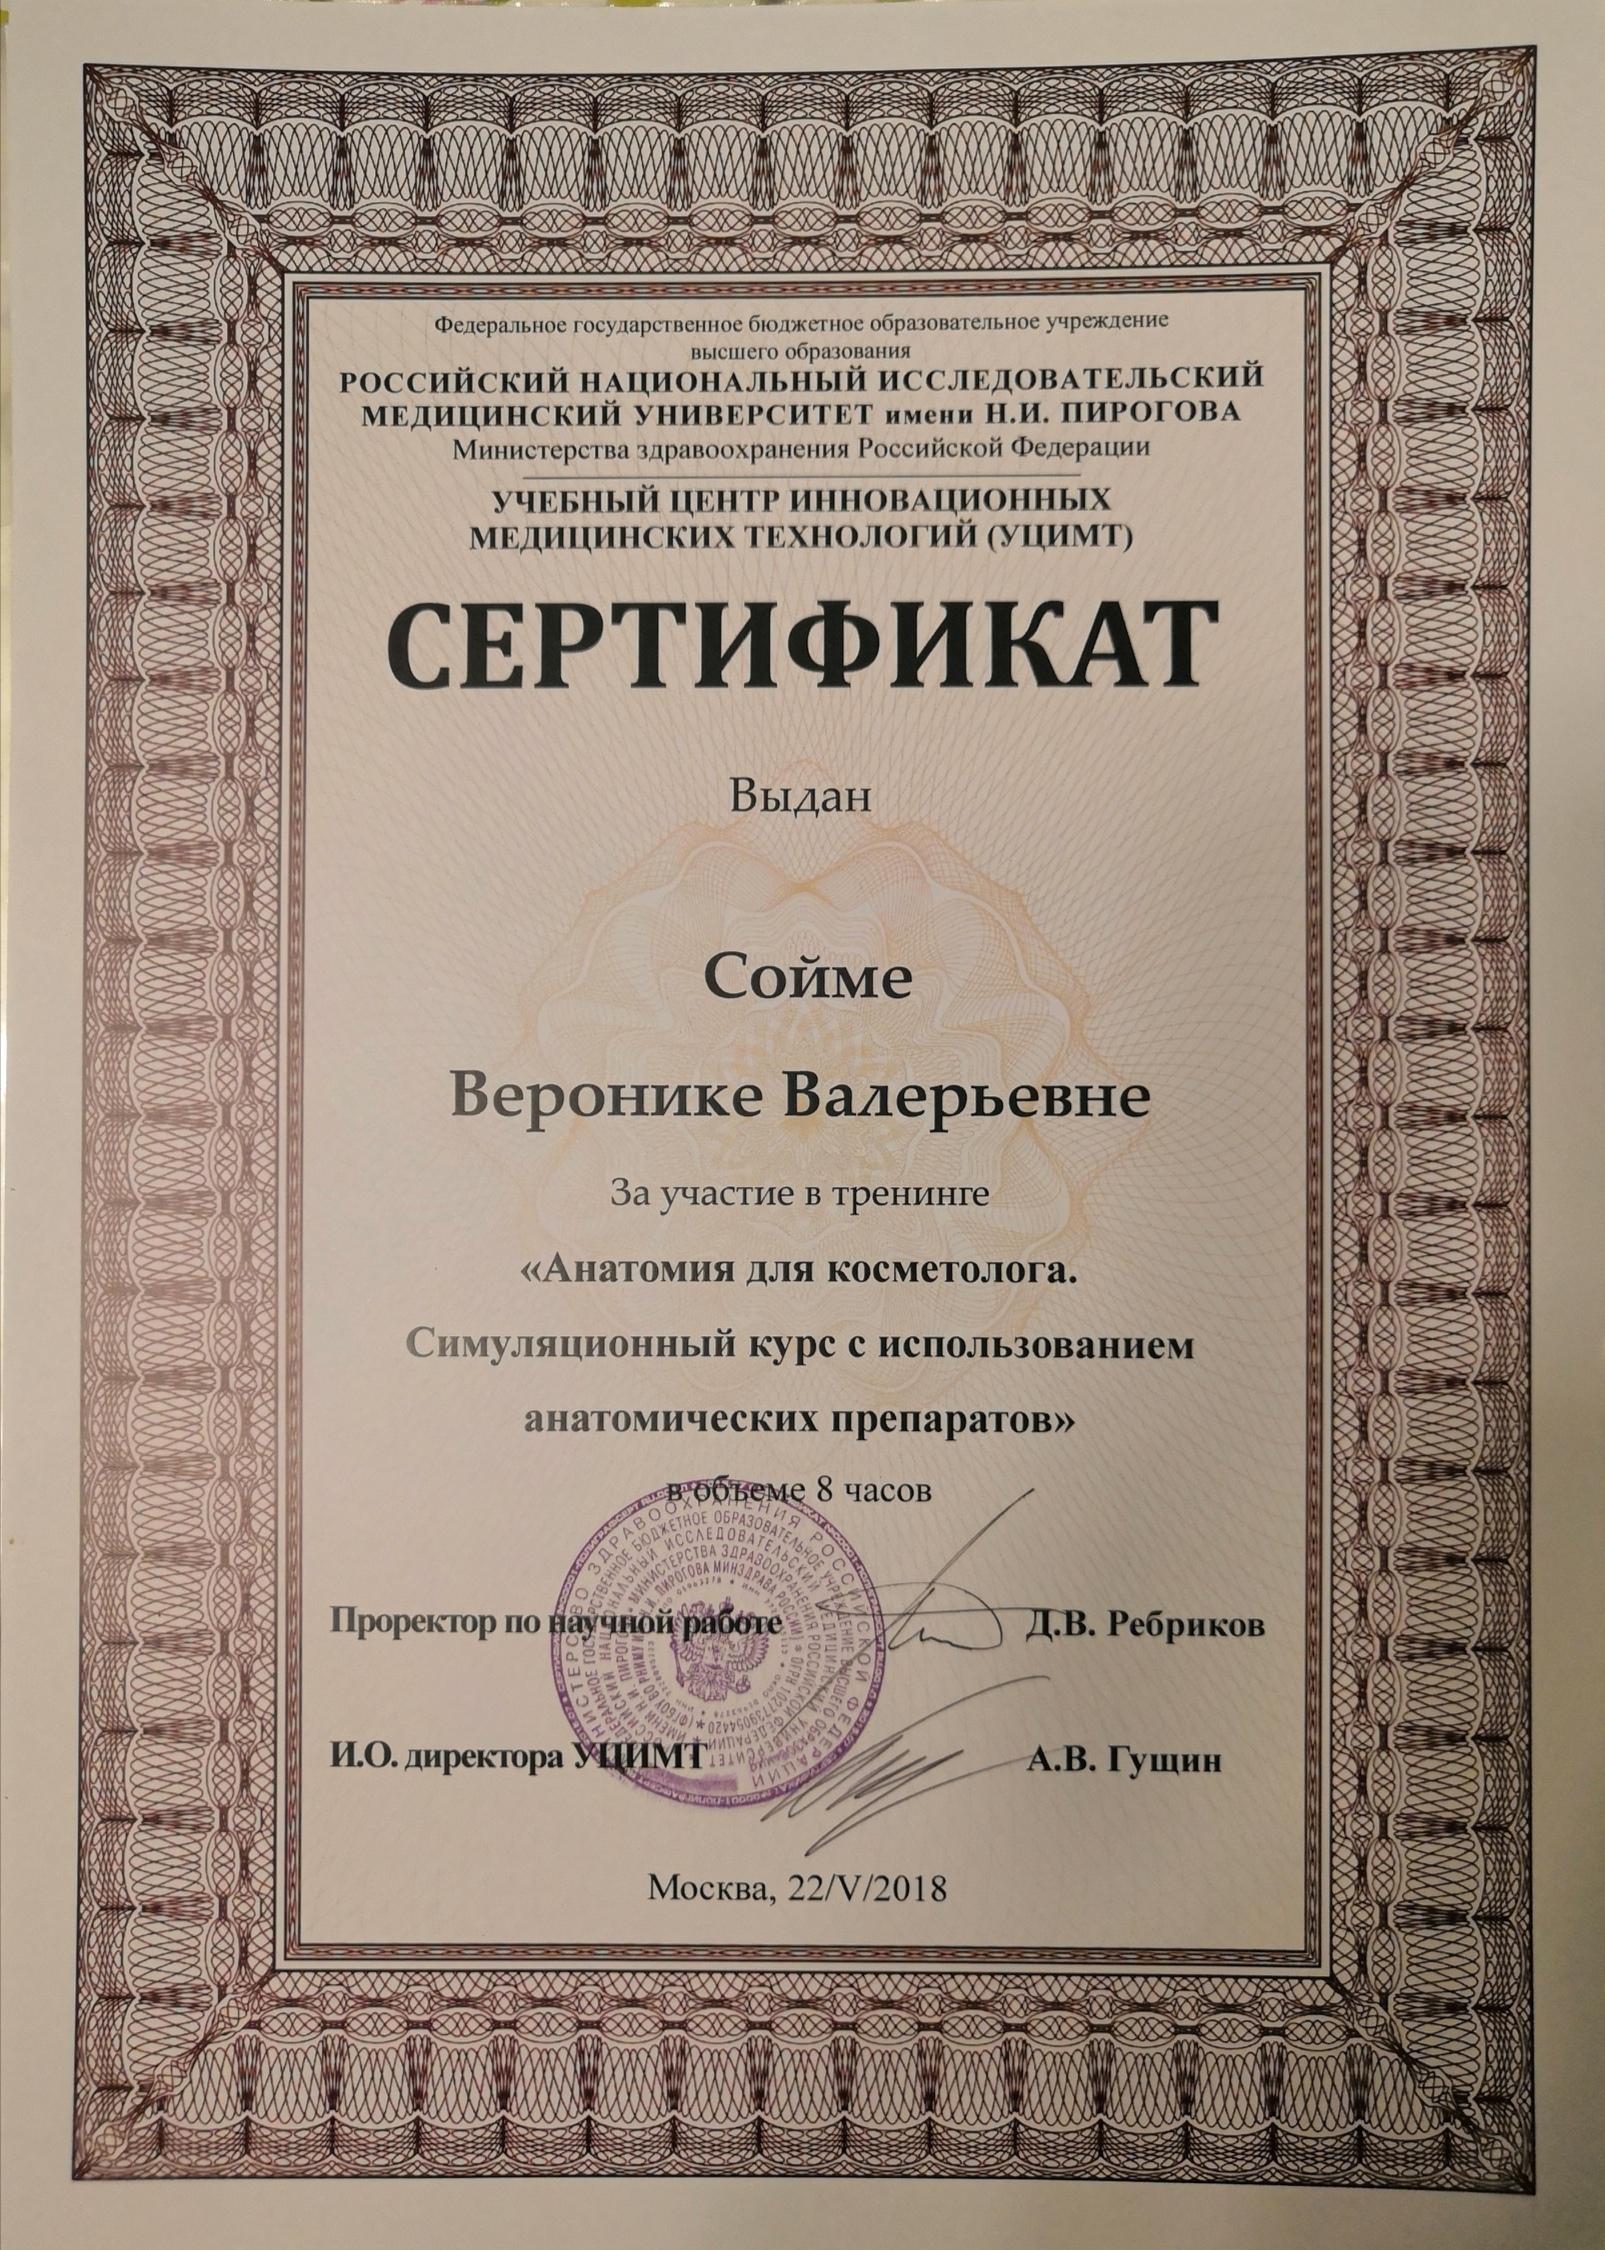 2018, Анатомия для косметолога